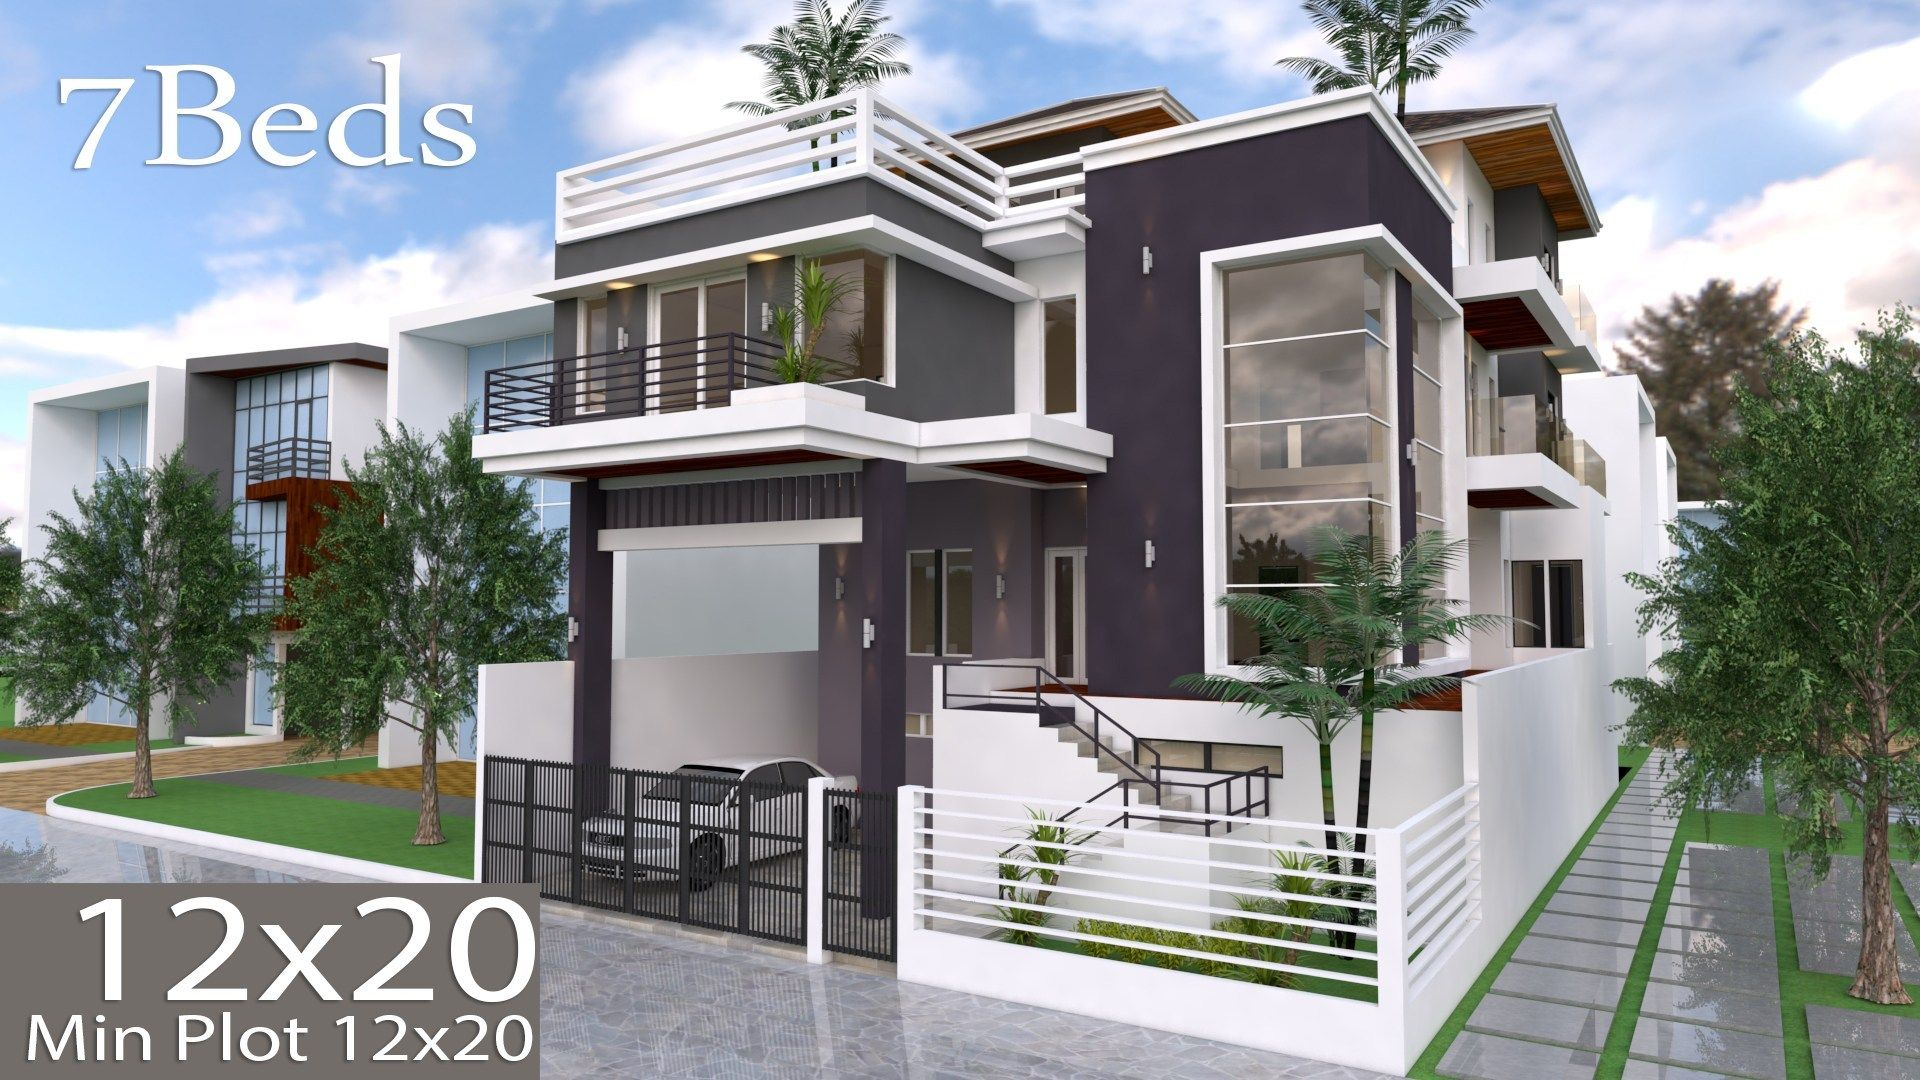 7 Bedrooms Modern Home Design Plan 12mx20m Samphoas Com Architectural House Plans House Plans Home Design Plan